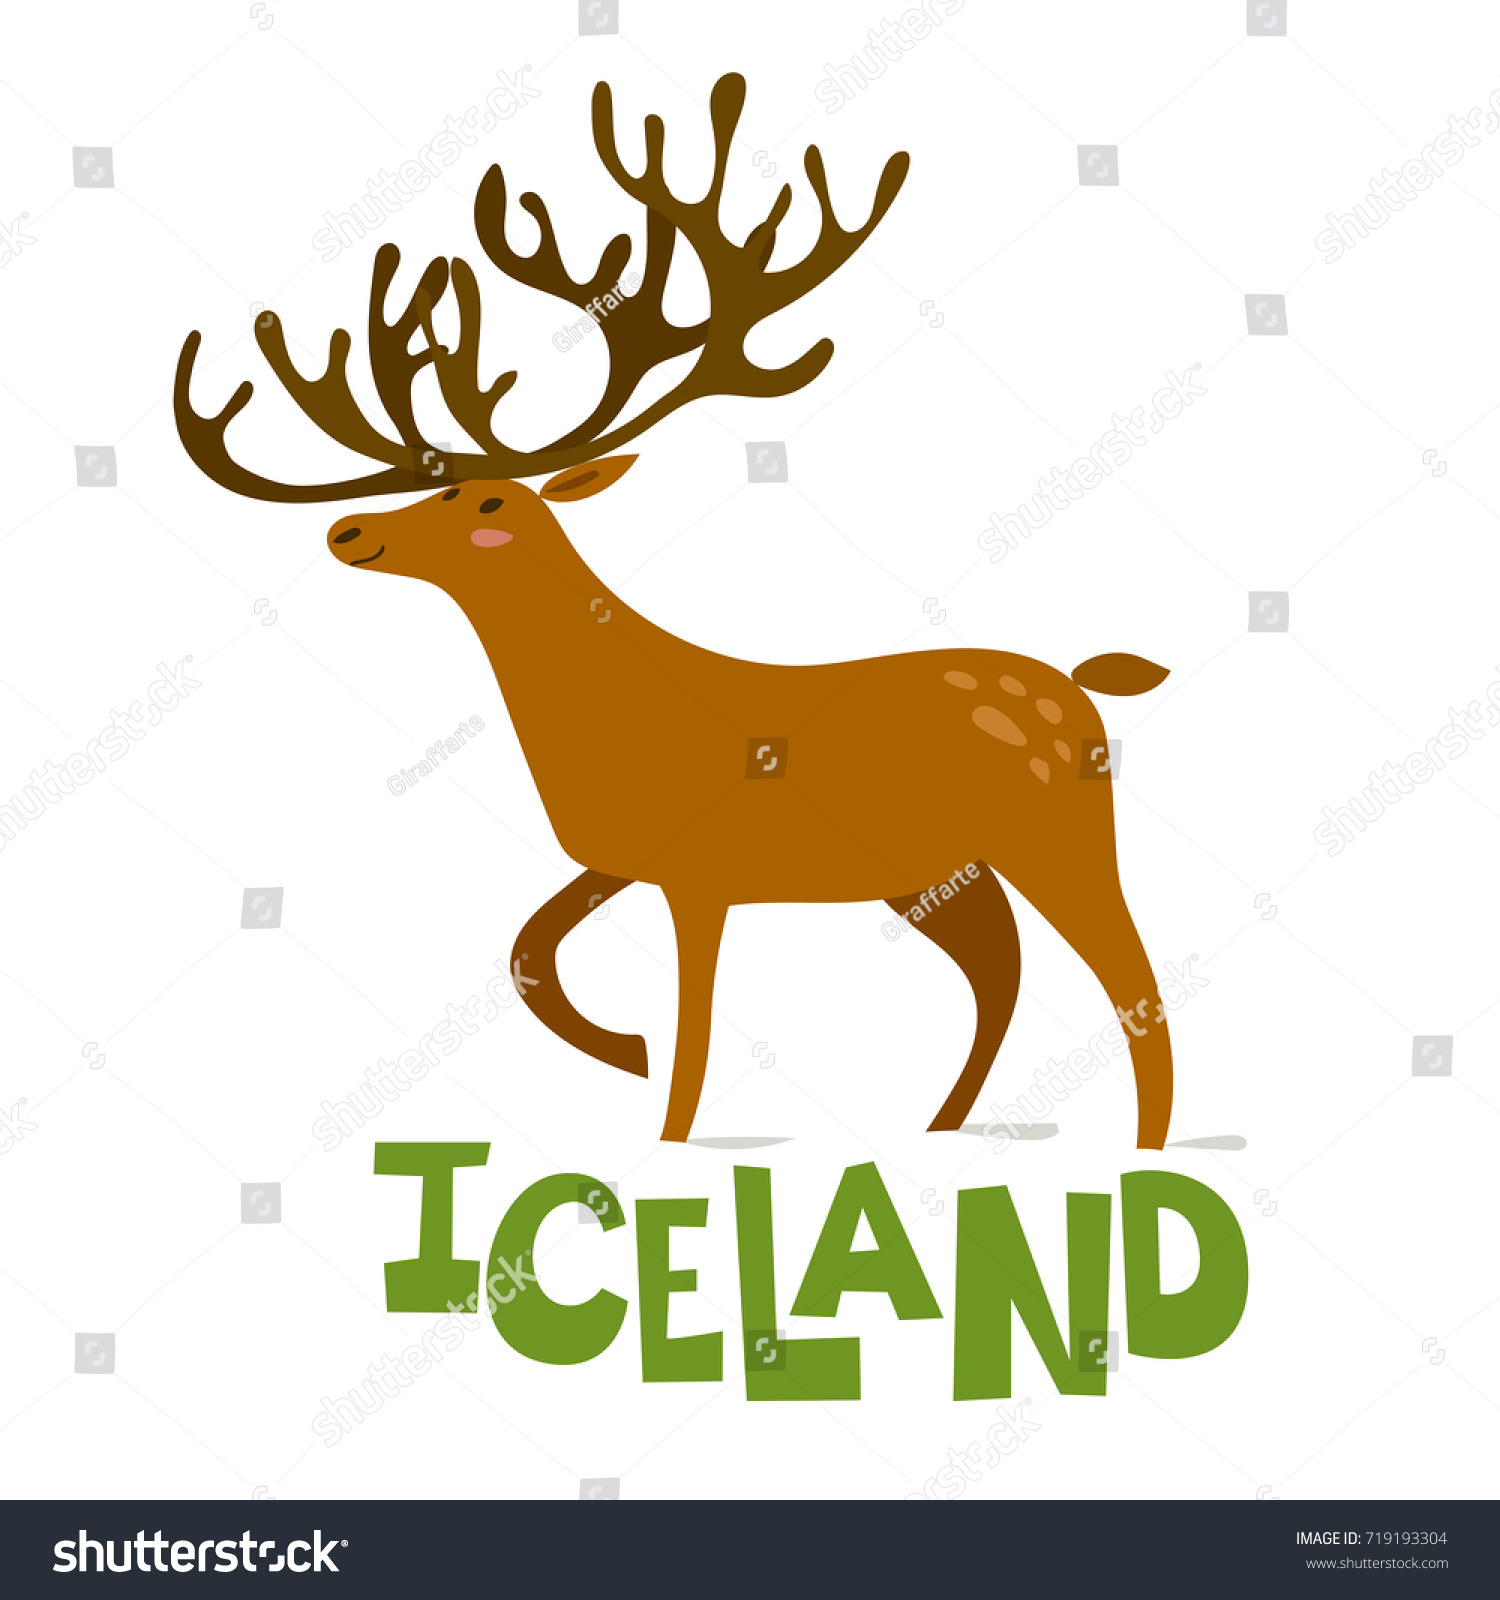 Vector Illustration Icelandic Deer Stock Vector (Royalty Free ...